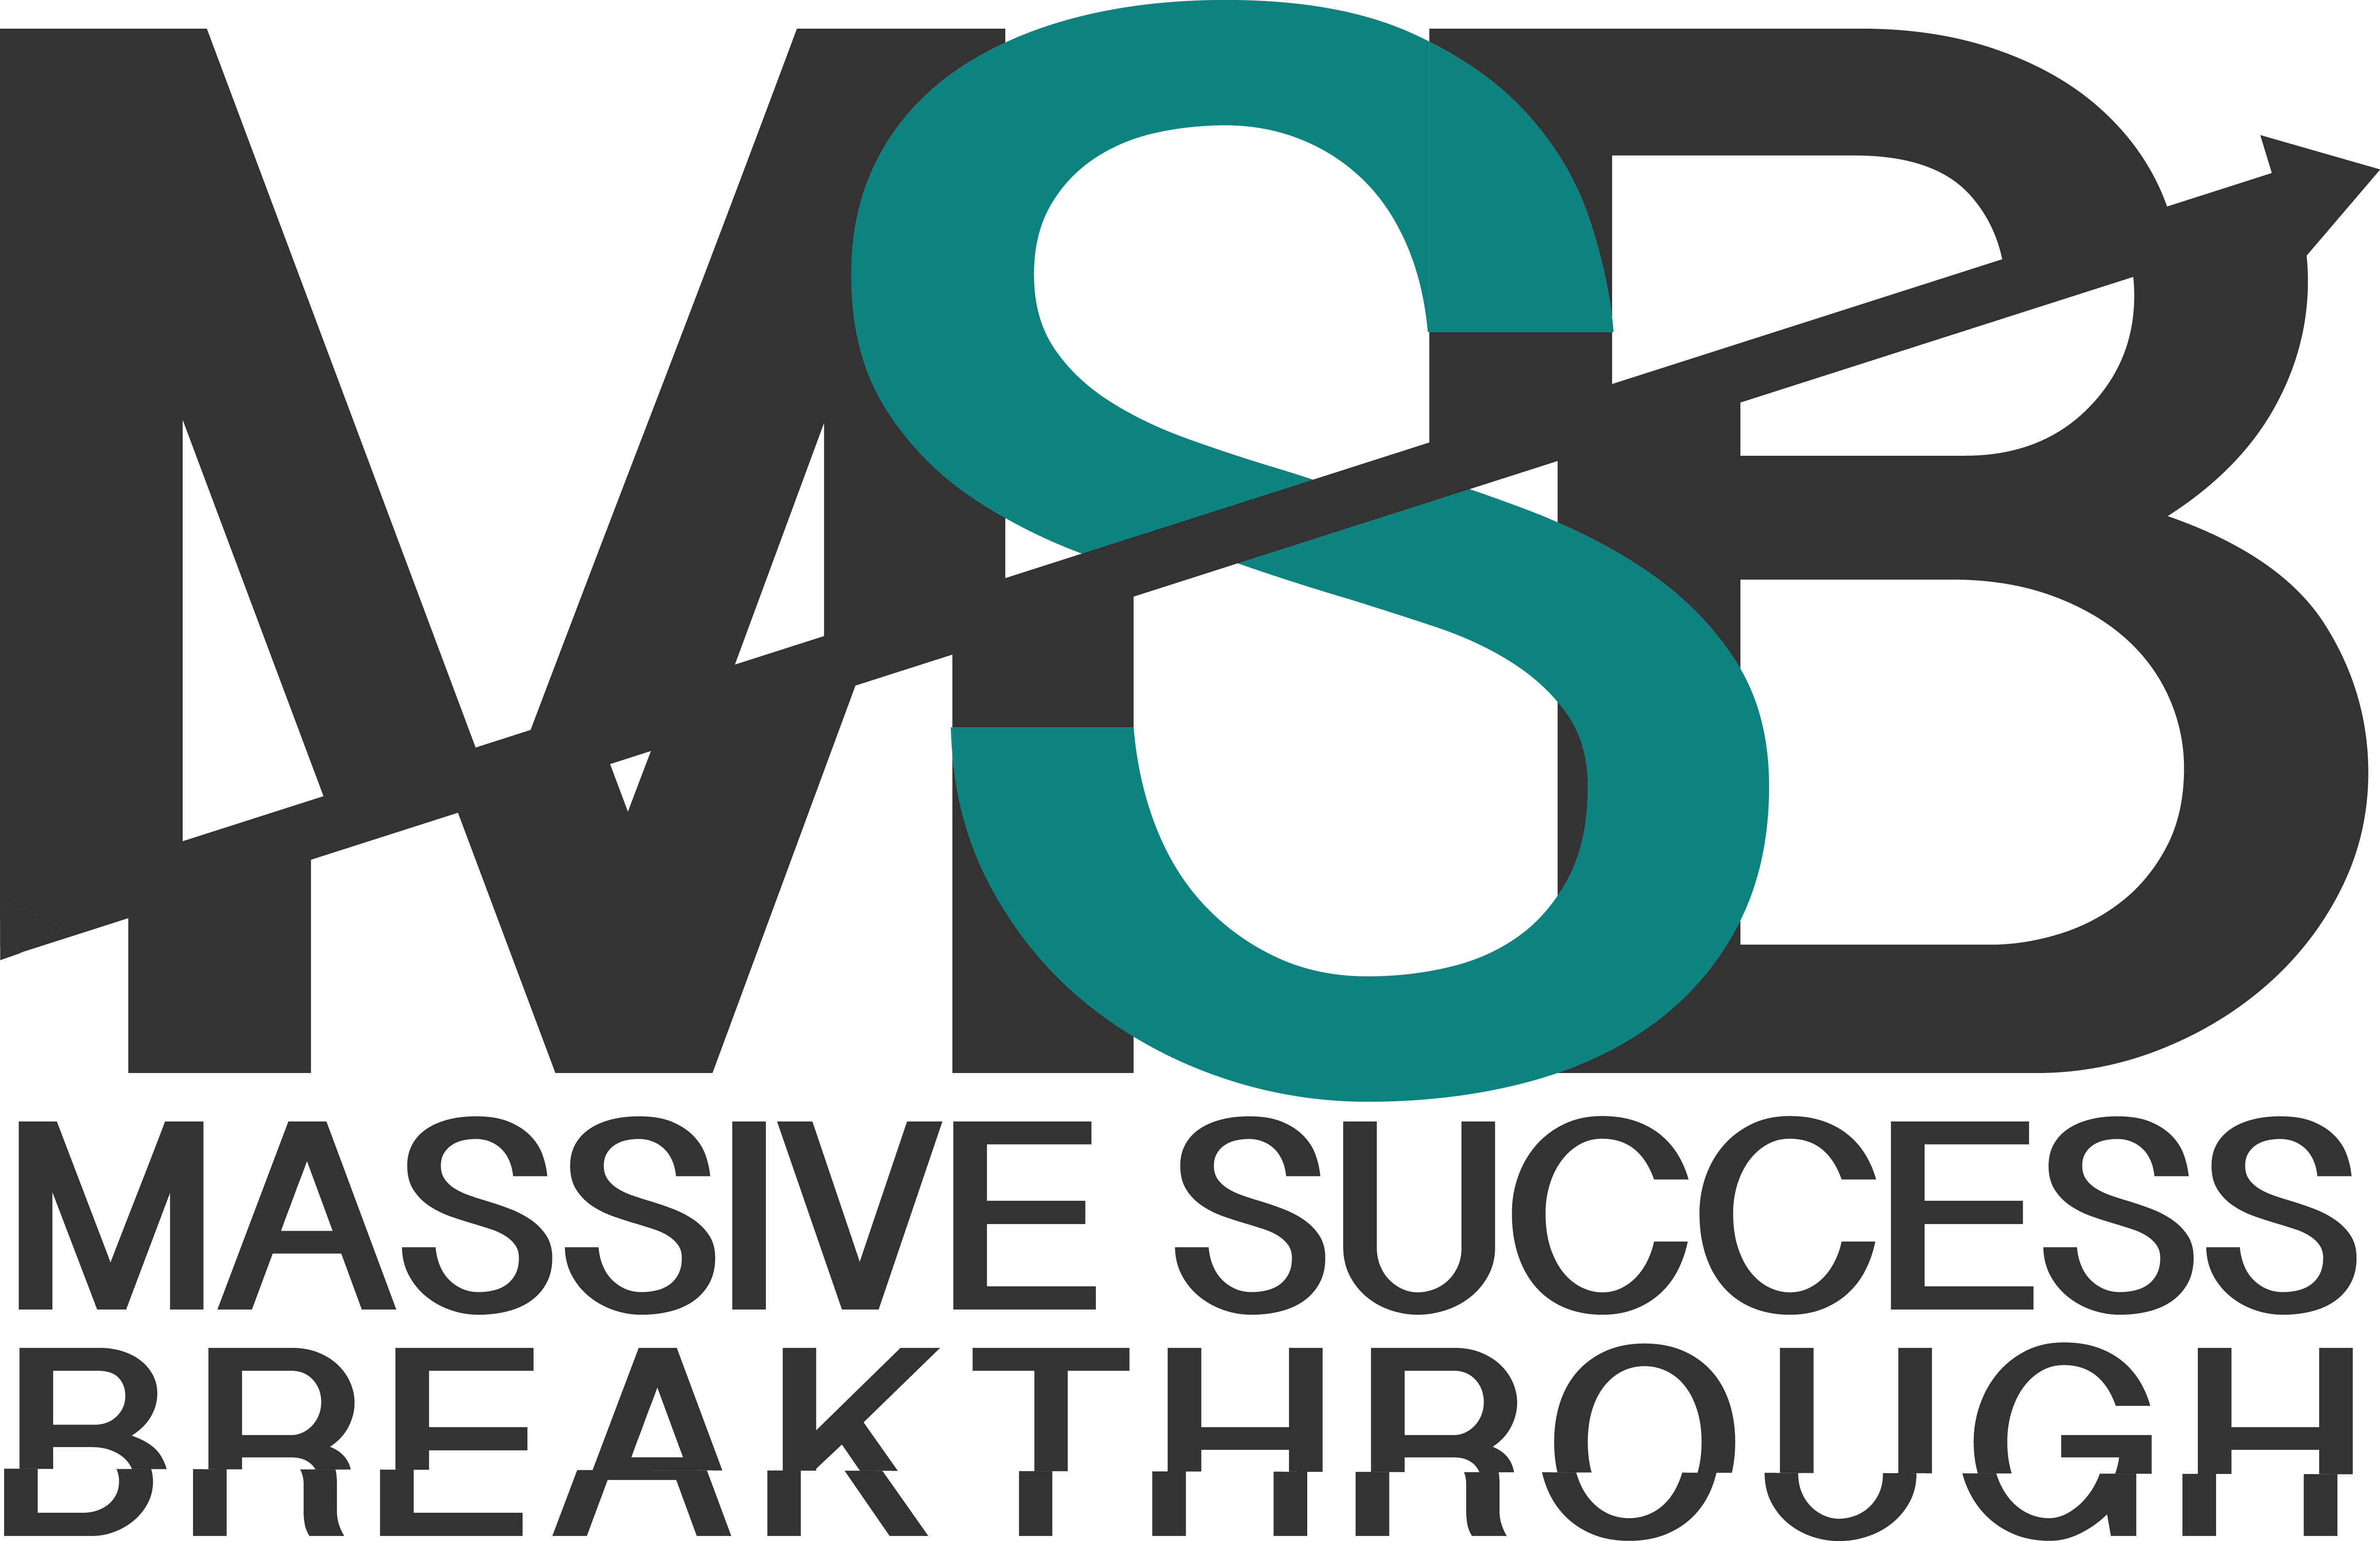 MSB-logo-Vertical-Trans